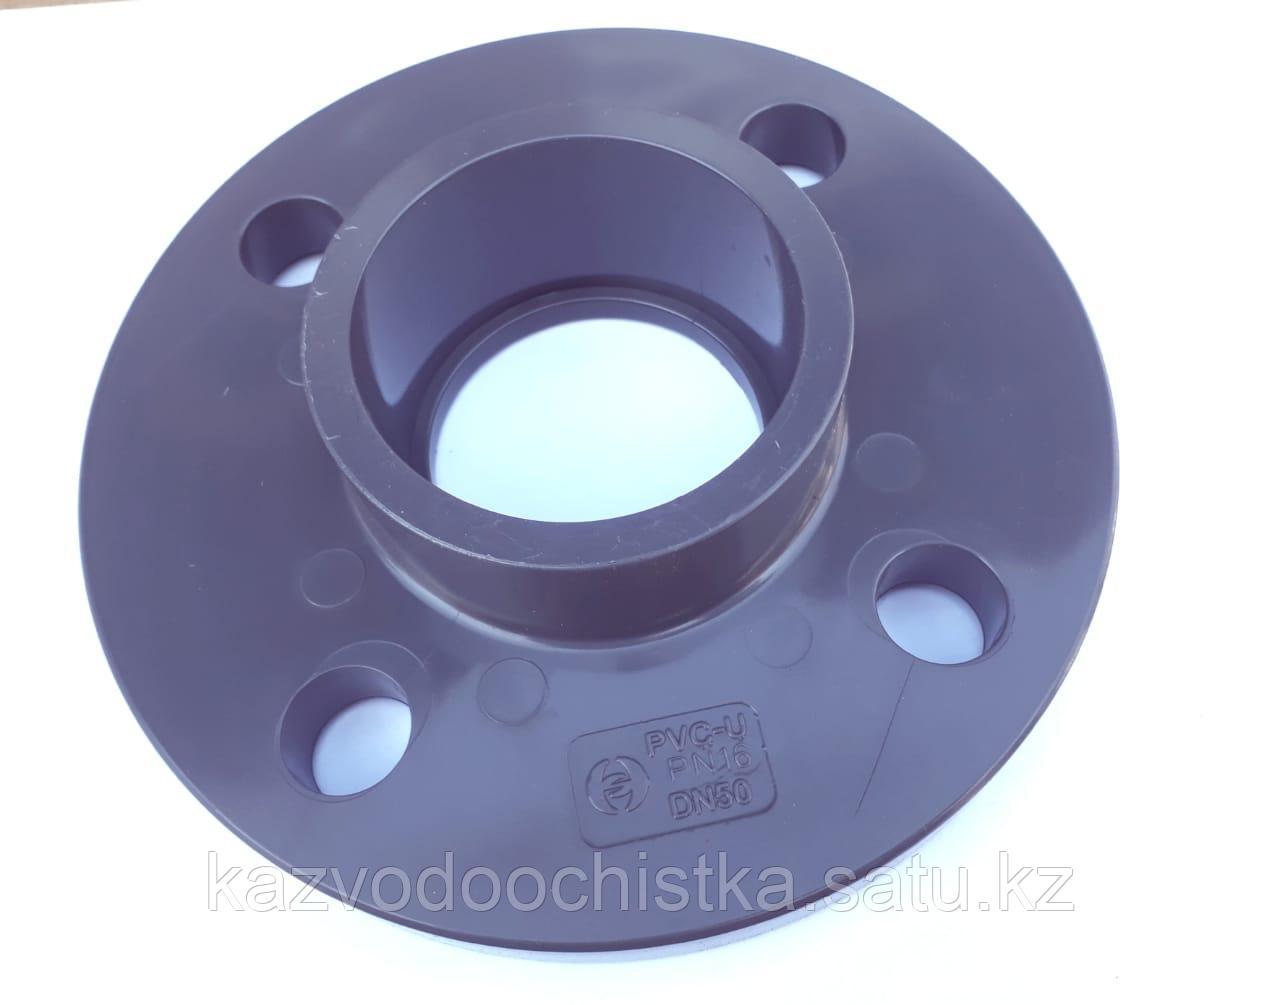 ПВХ Фланец (one piece flange PVC) 75 мм.